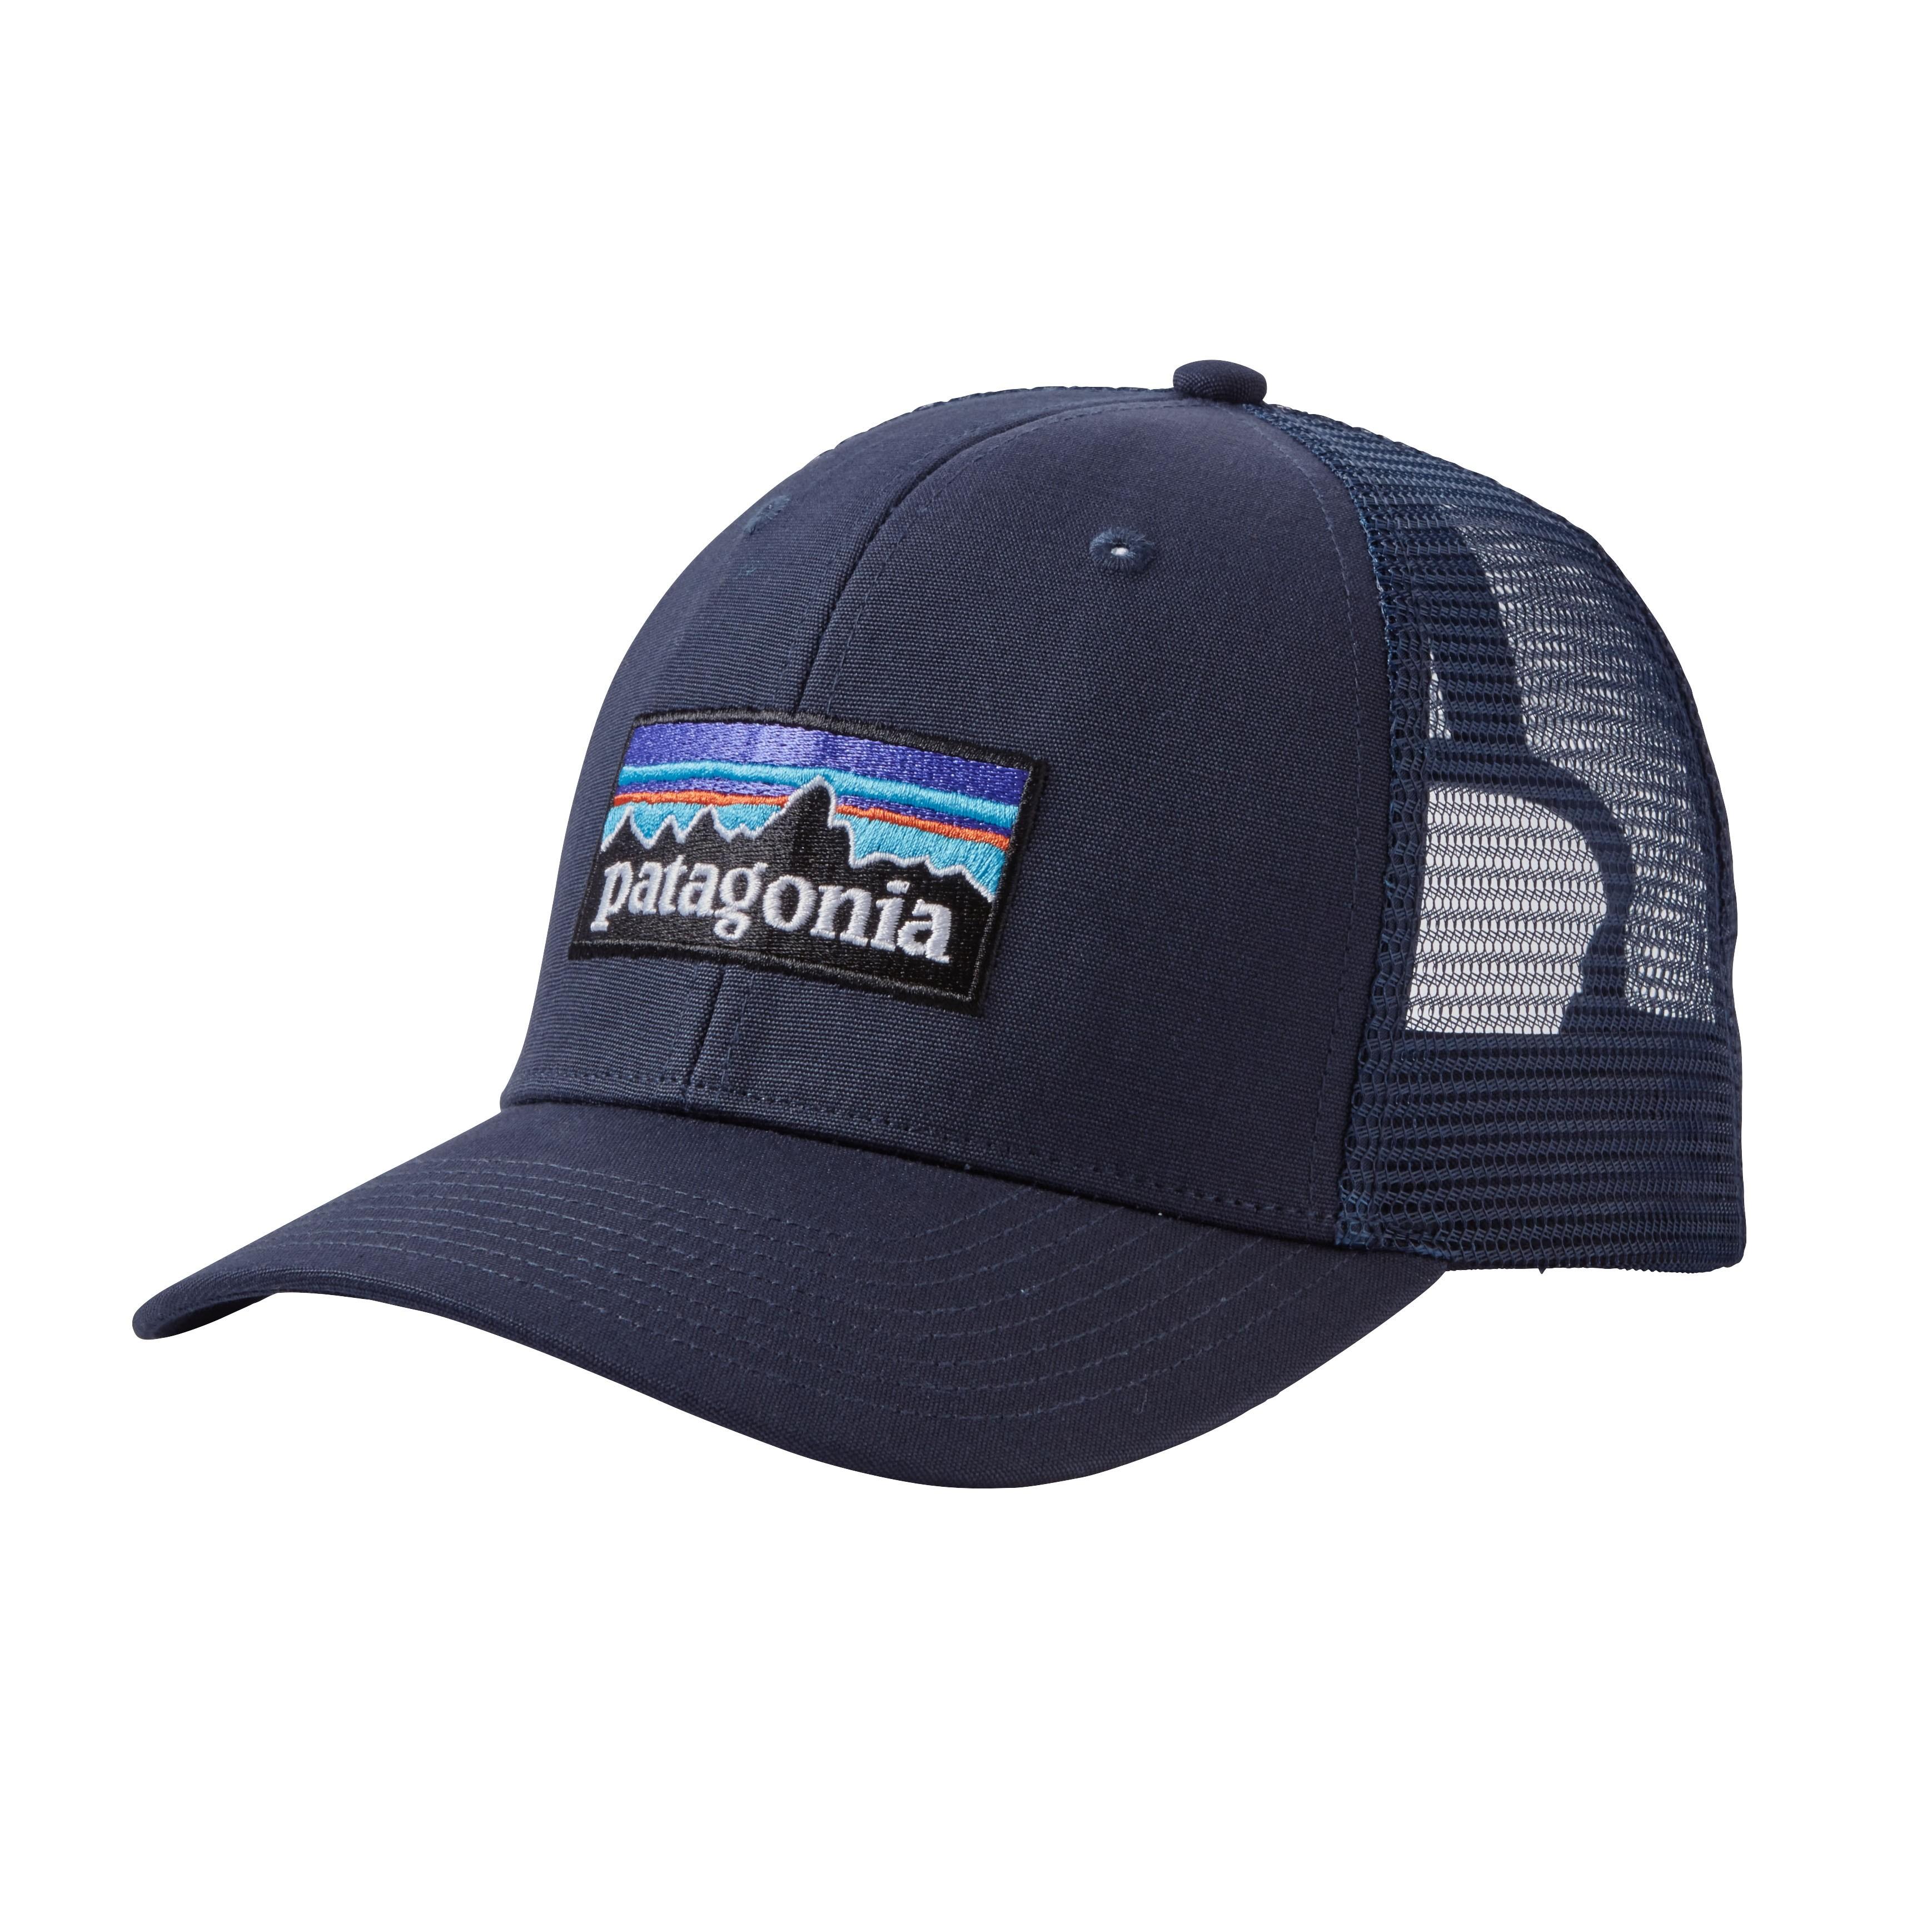 Patagonia P6 Trucker Hat- Navy Blue w/Navy Blue (NVNV)